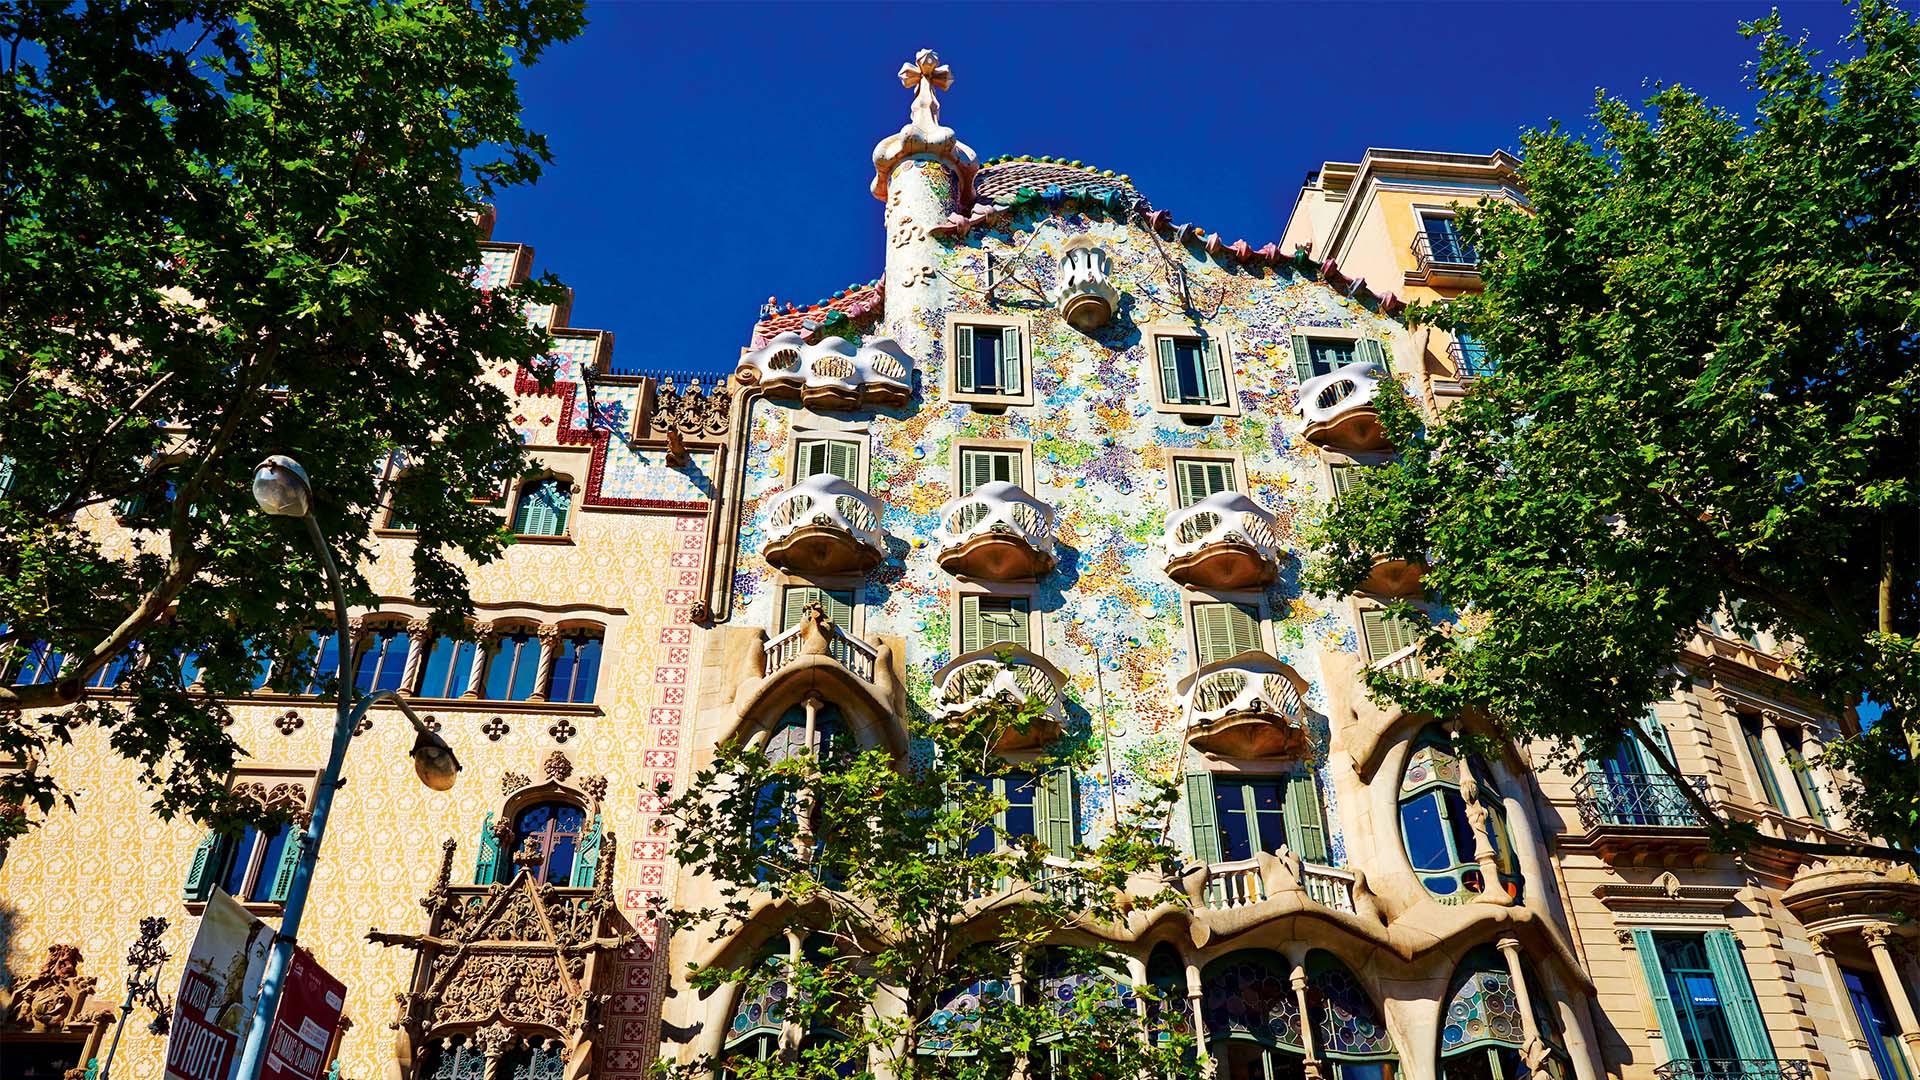 Architecture of Gaudi in Barcelona, Spain